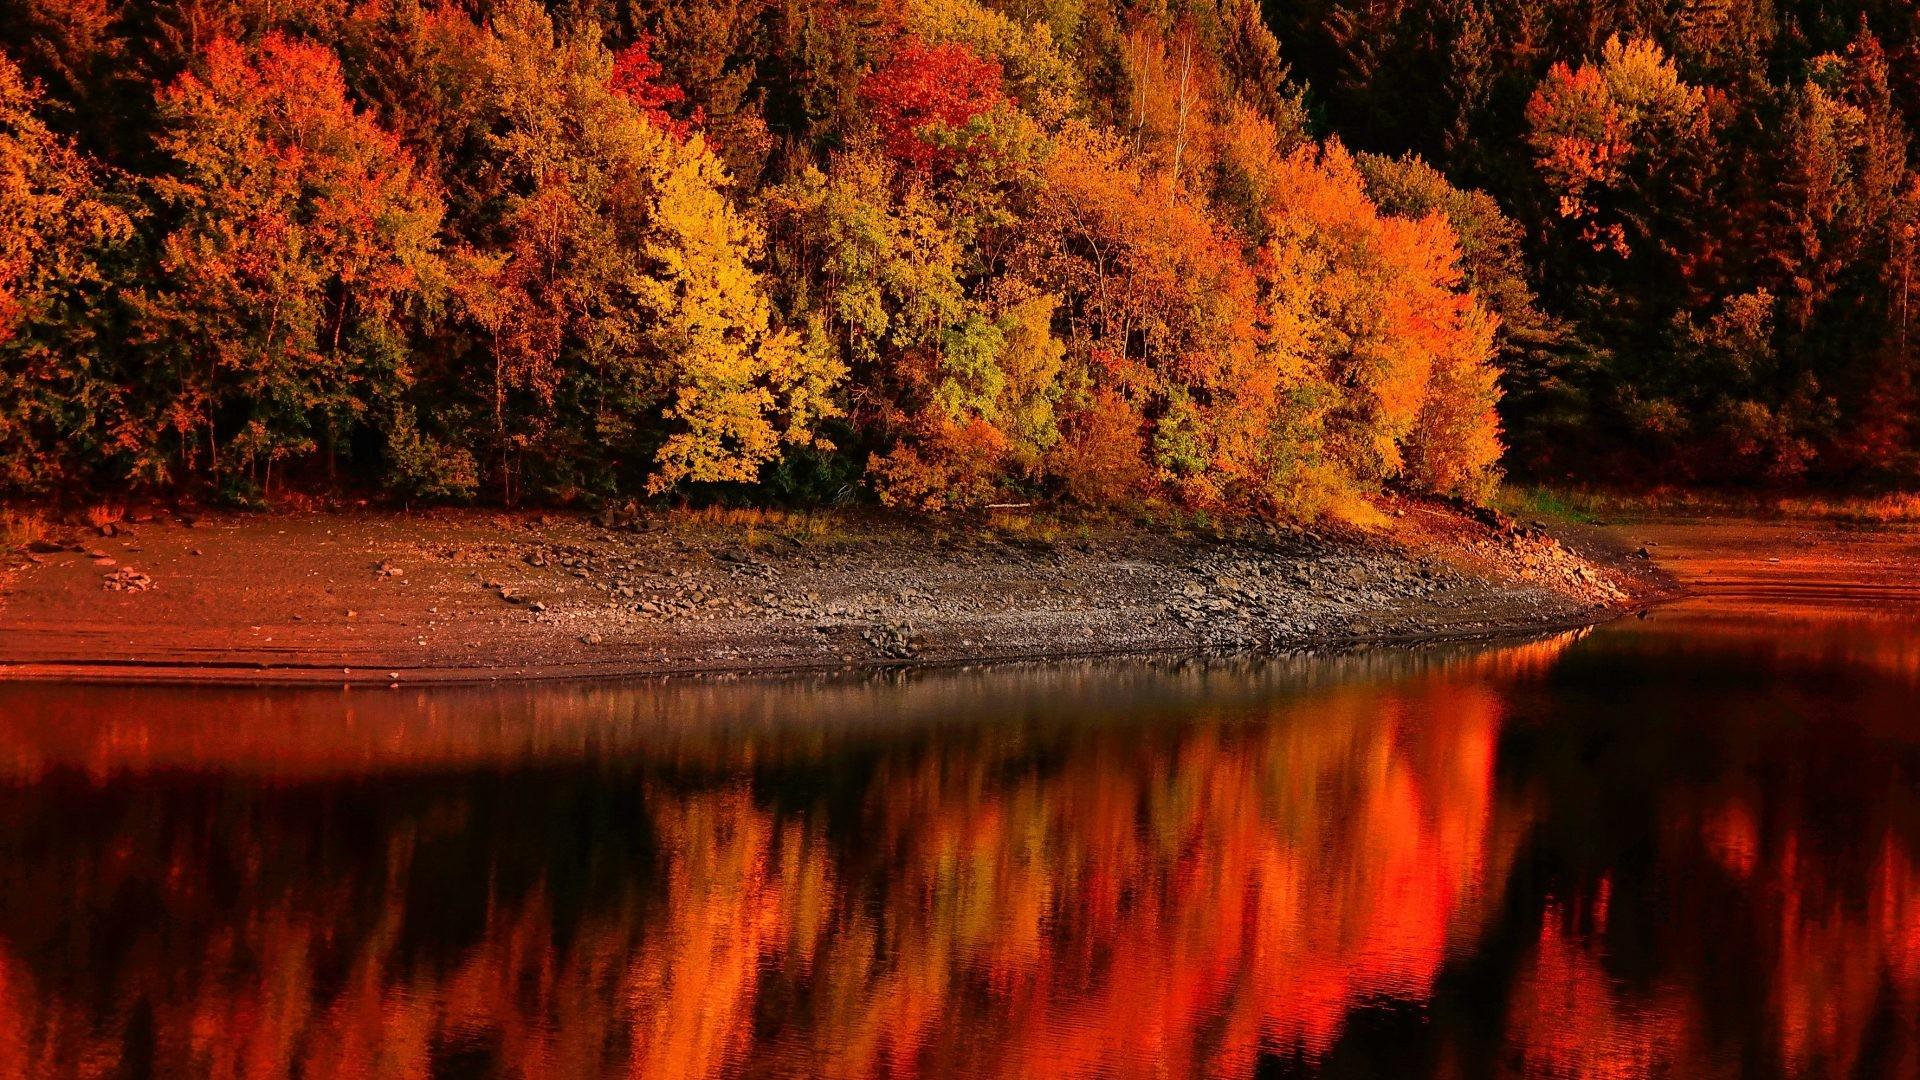 Autumn Tag – Serenity Fall Reflections Shore Red Lake Trees Calmness  Beautiful Foliage River Autumn Free